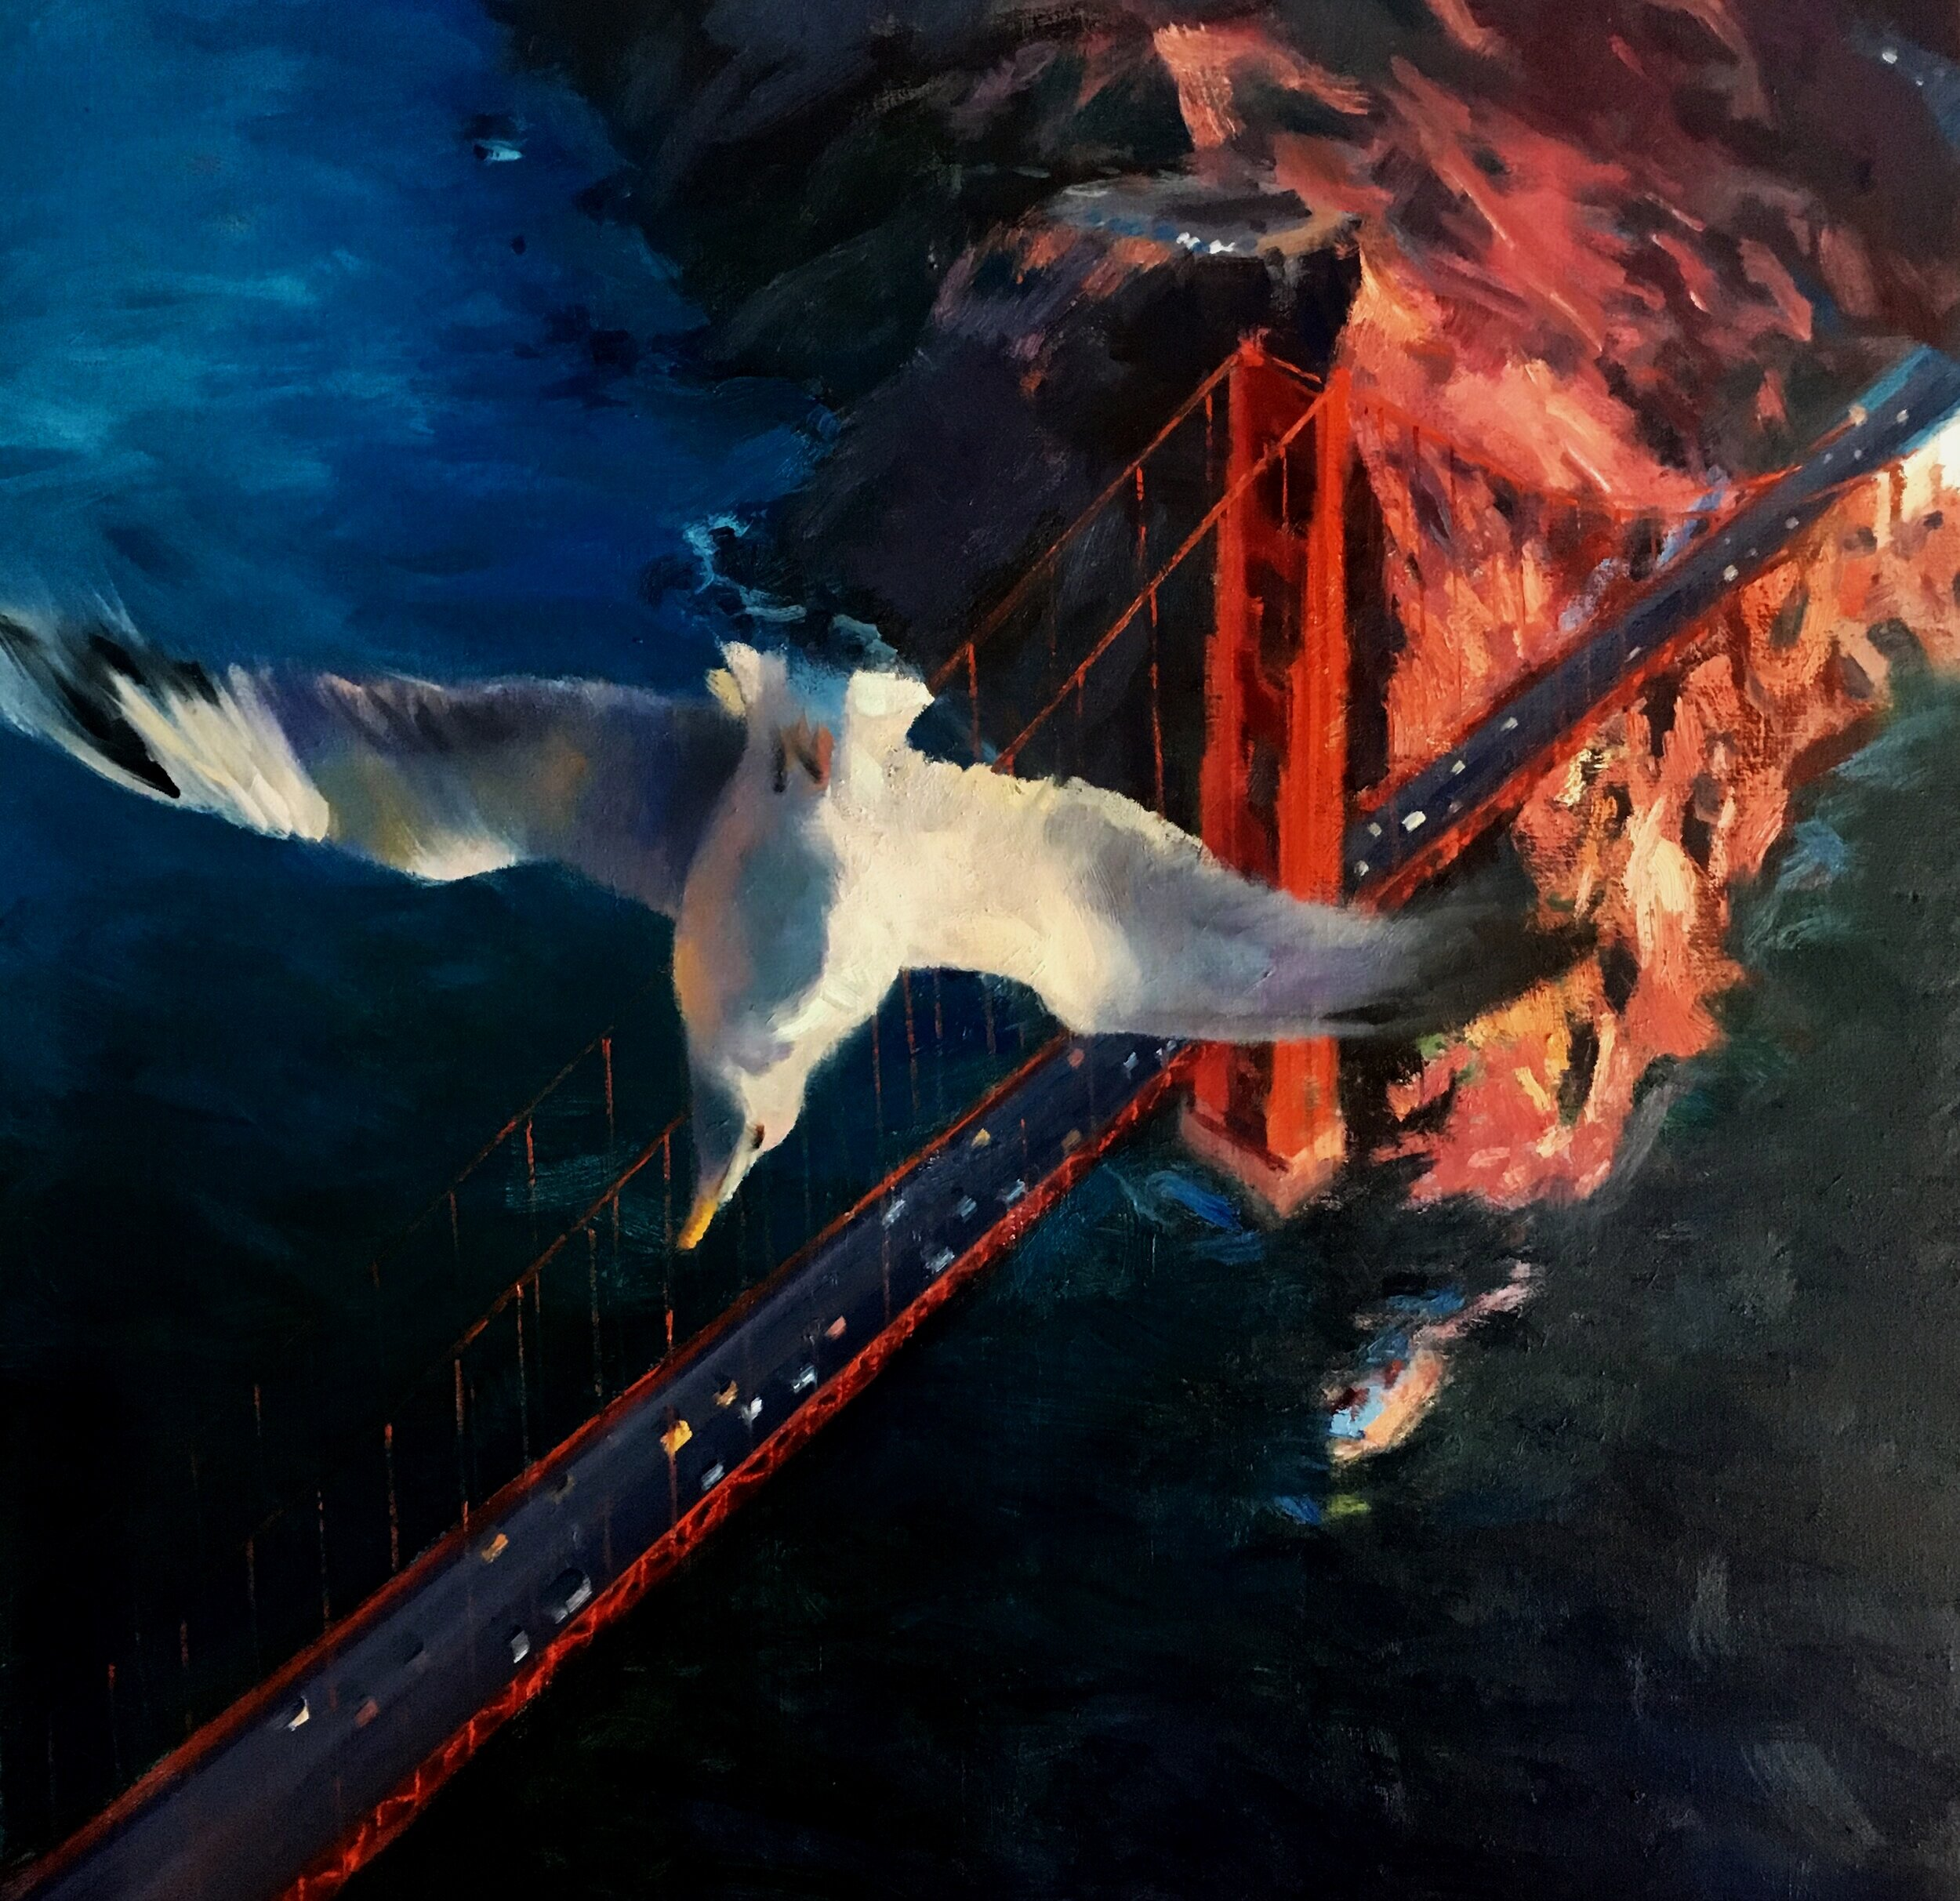 BIRD EYES VIEW # 7